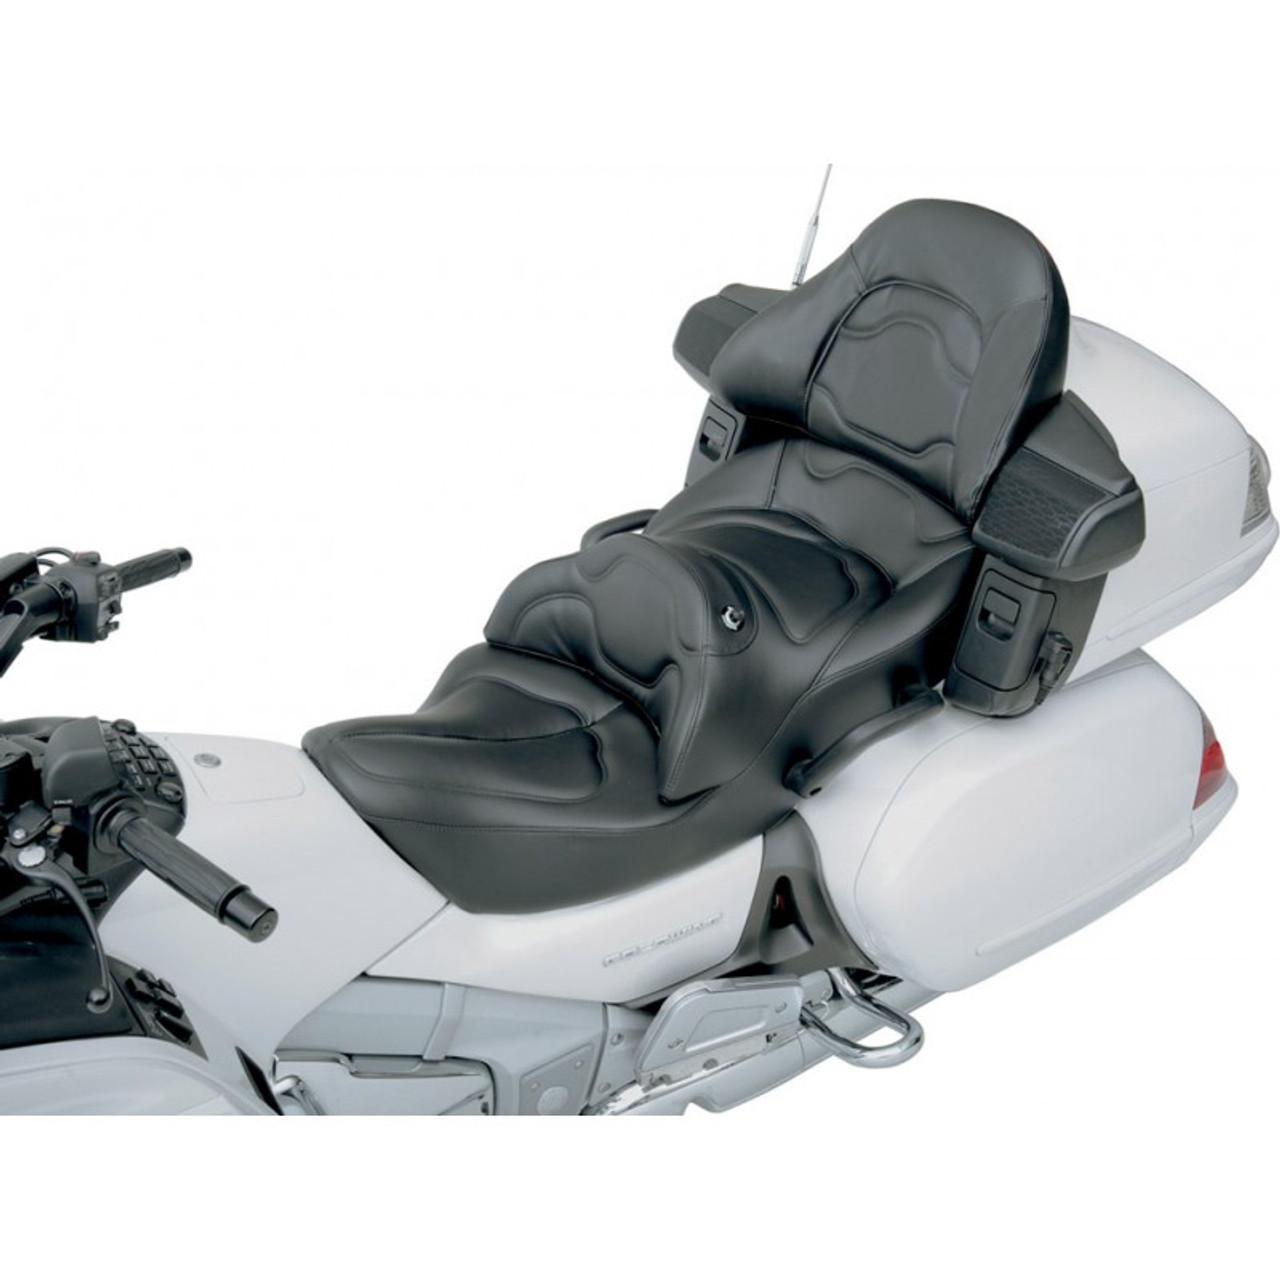 Outstanding Saddlemen Honda Gl1800 Goldwing 01 10 Road Sofa Seat Home Interior And Landscaping Ologienasavecom